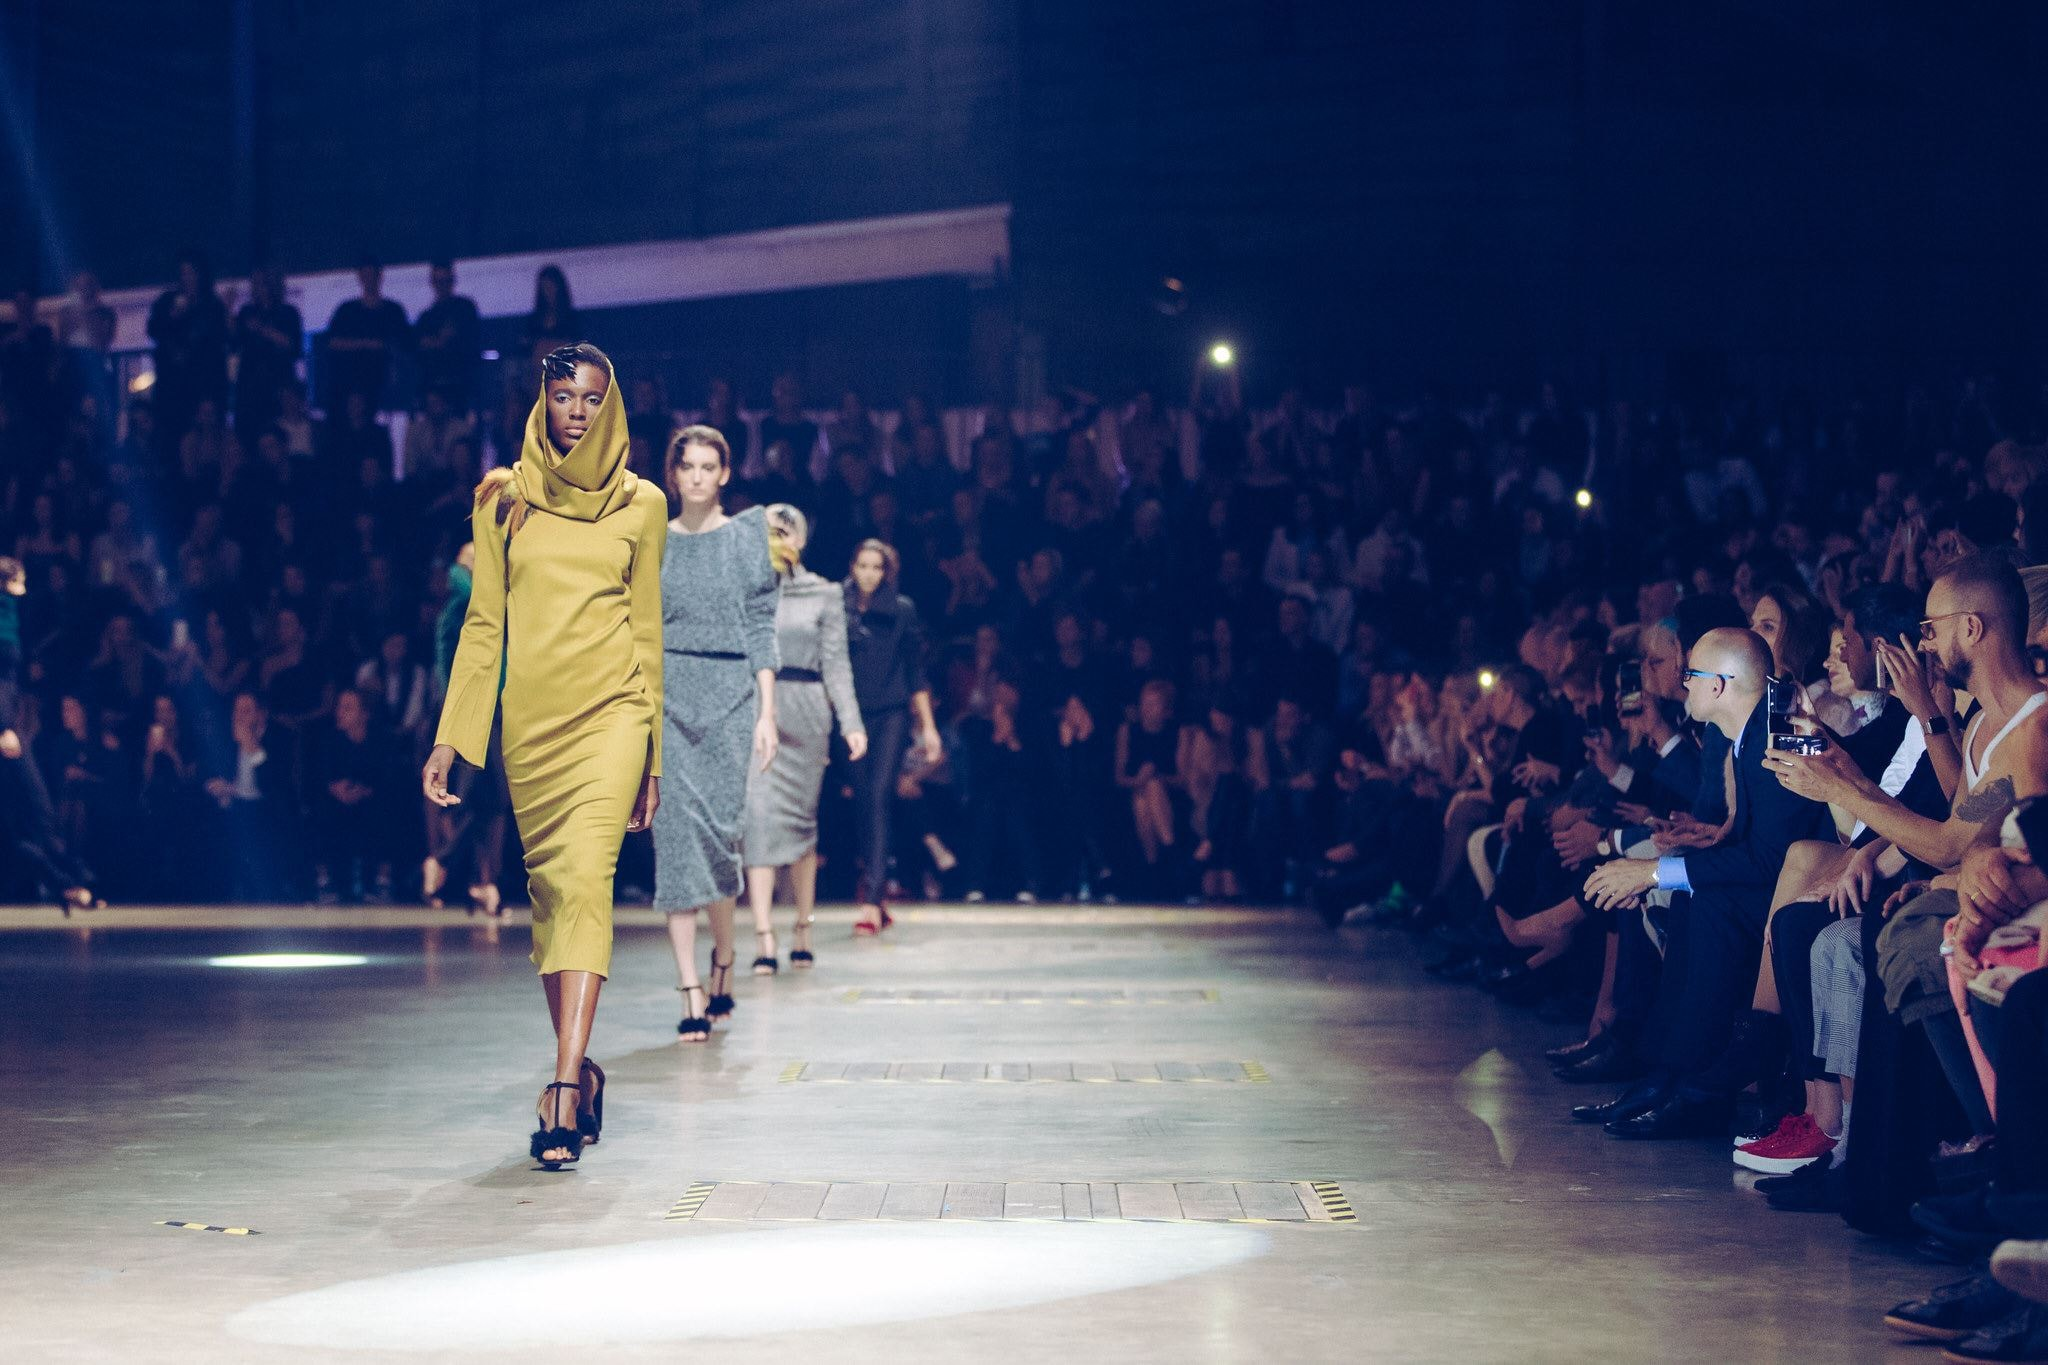 Tanja Zorn Fashion Show at MBFW © Jure Makovec, Žiga Intihar, Haze Management/ Courtesy of MBFW